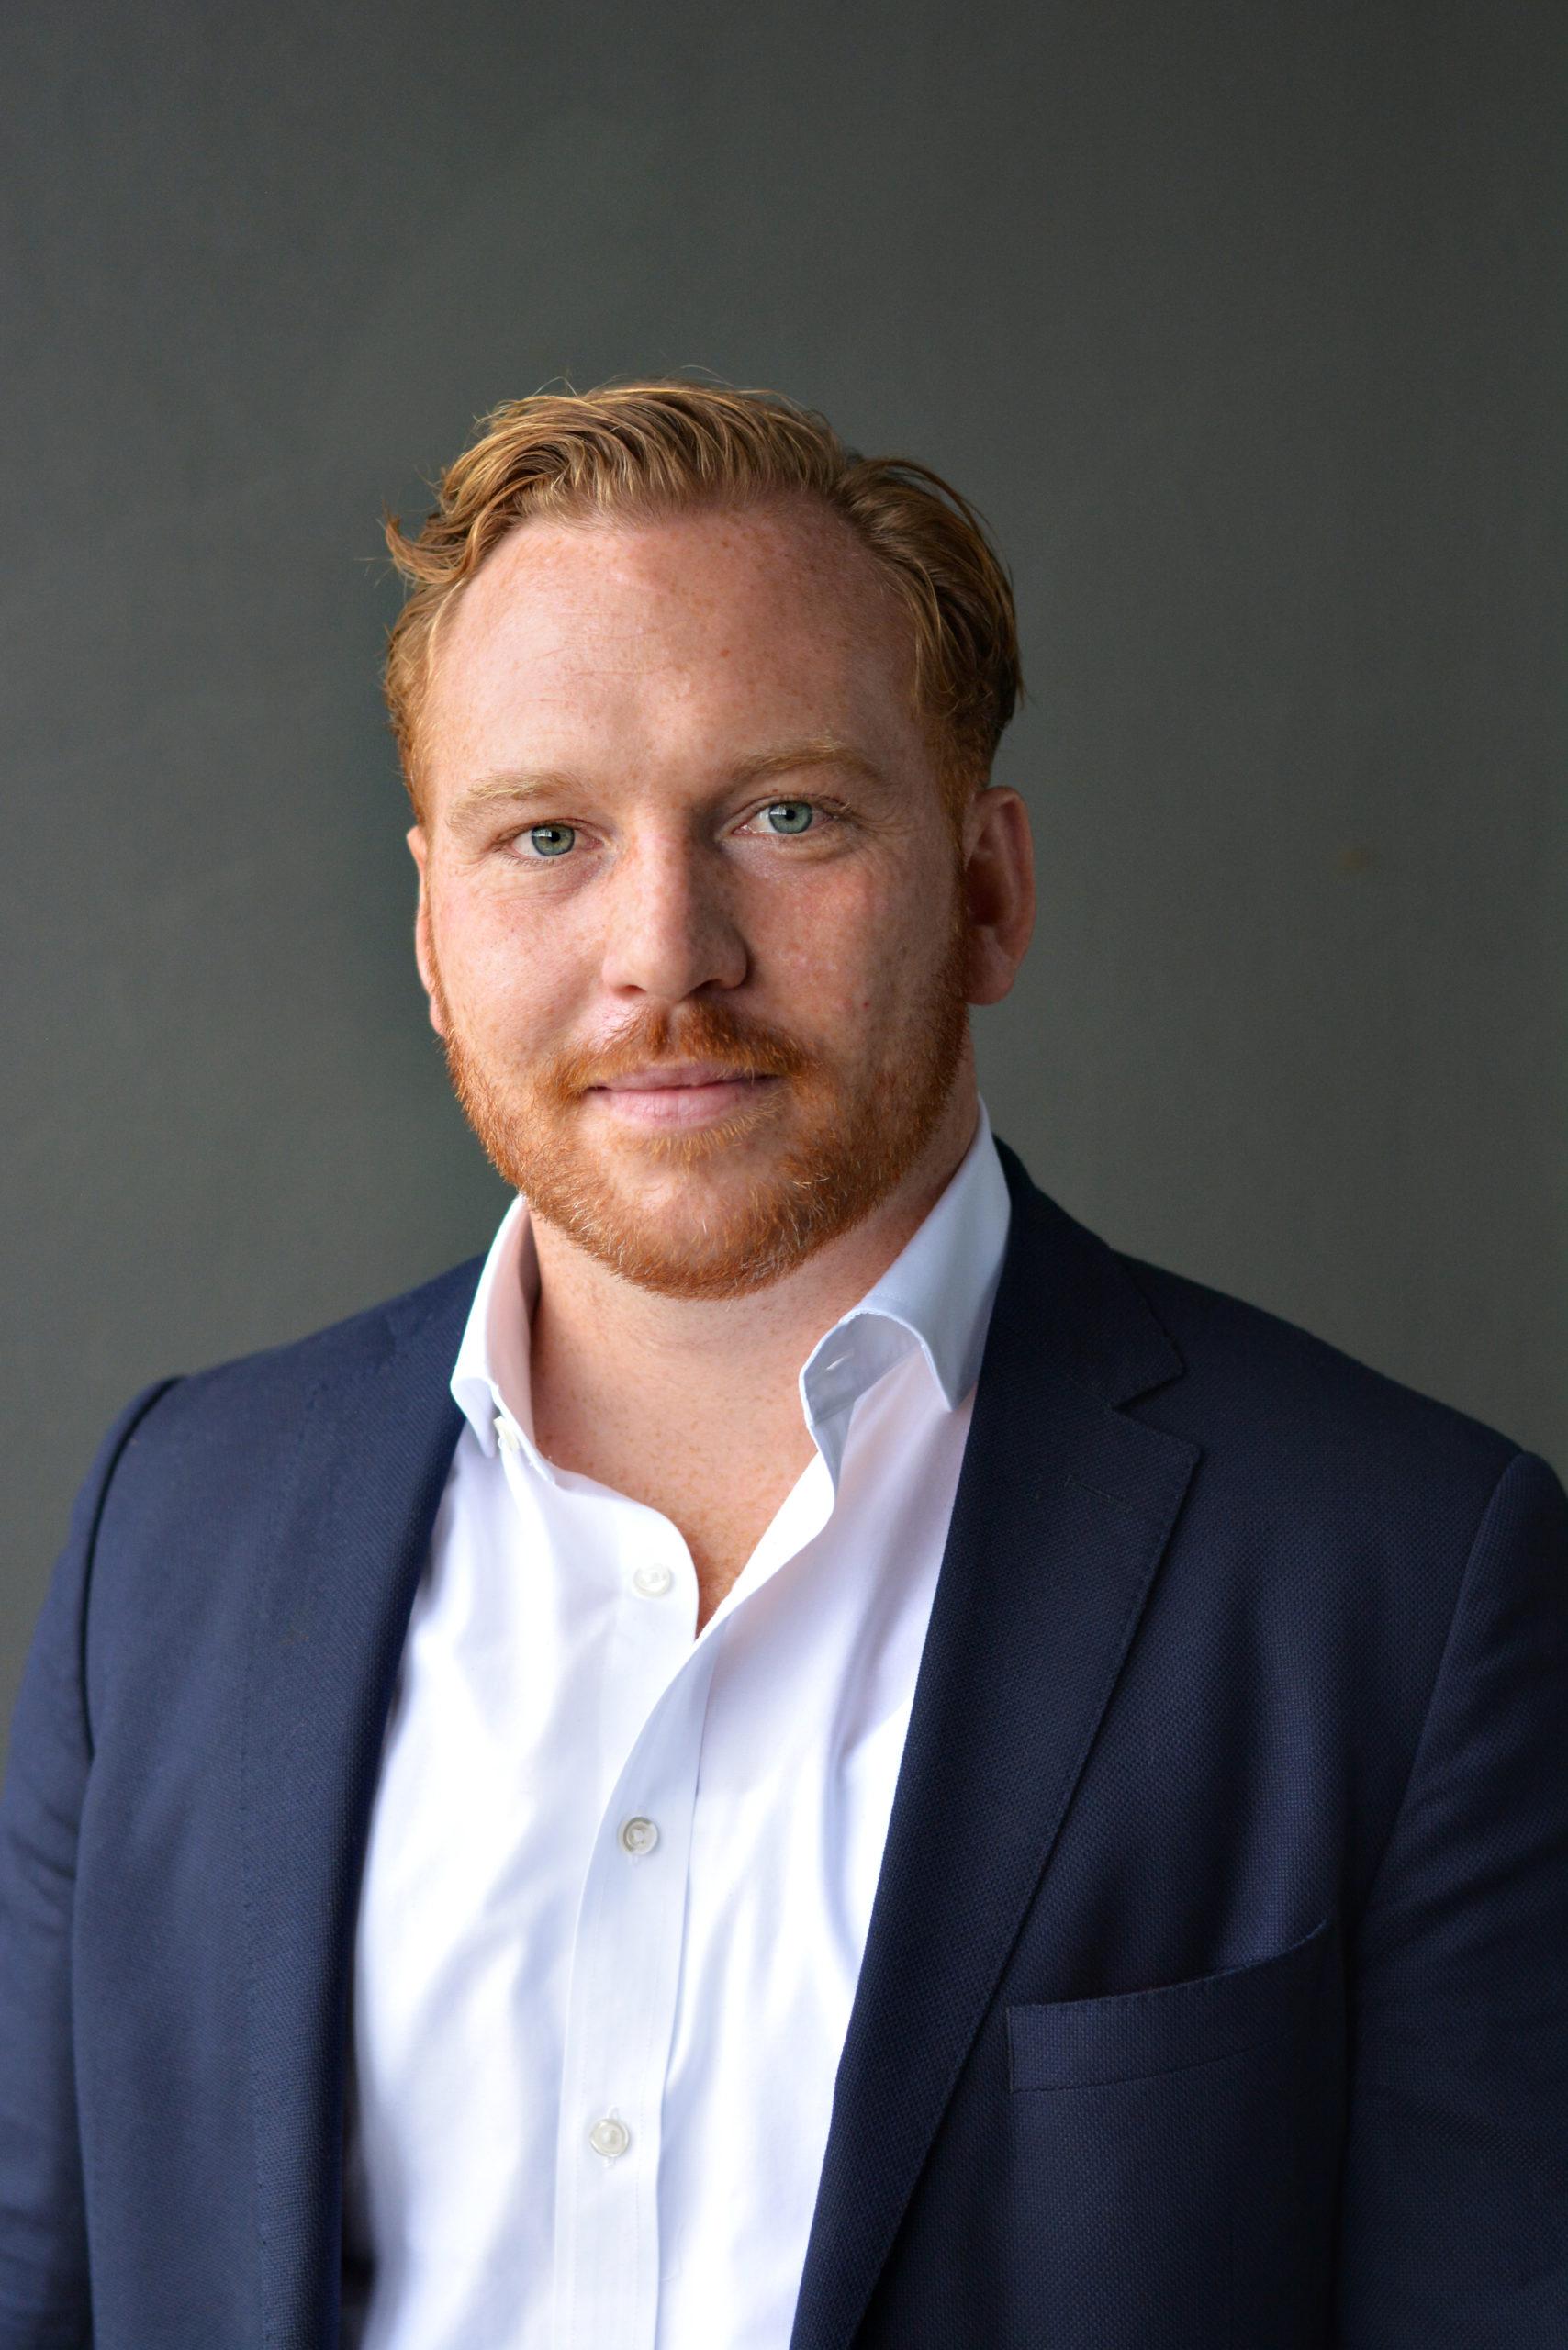 Anders Høyer